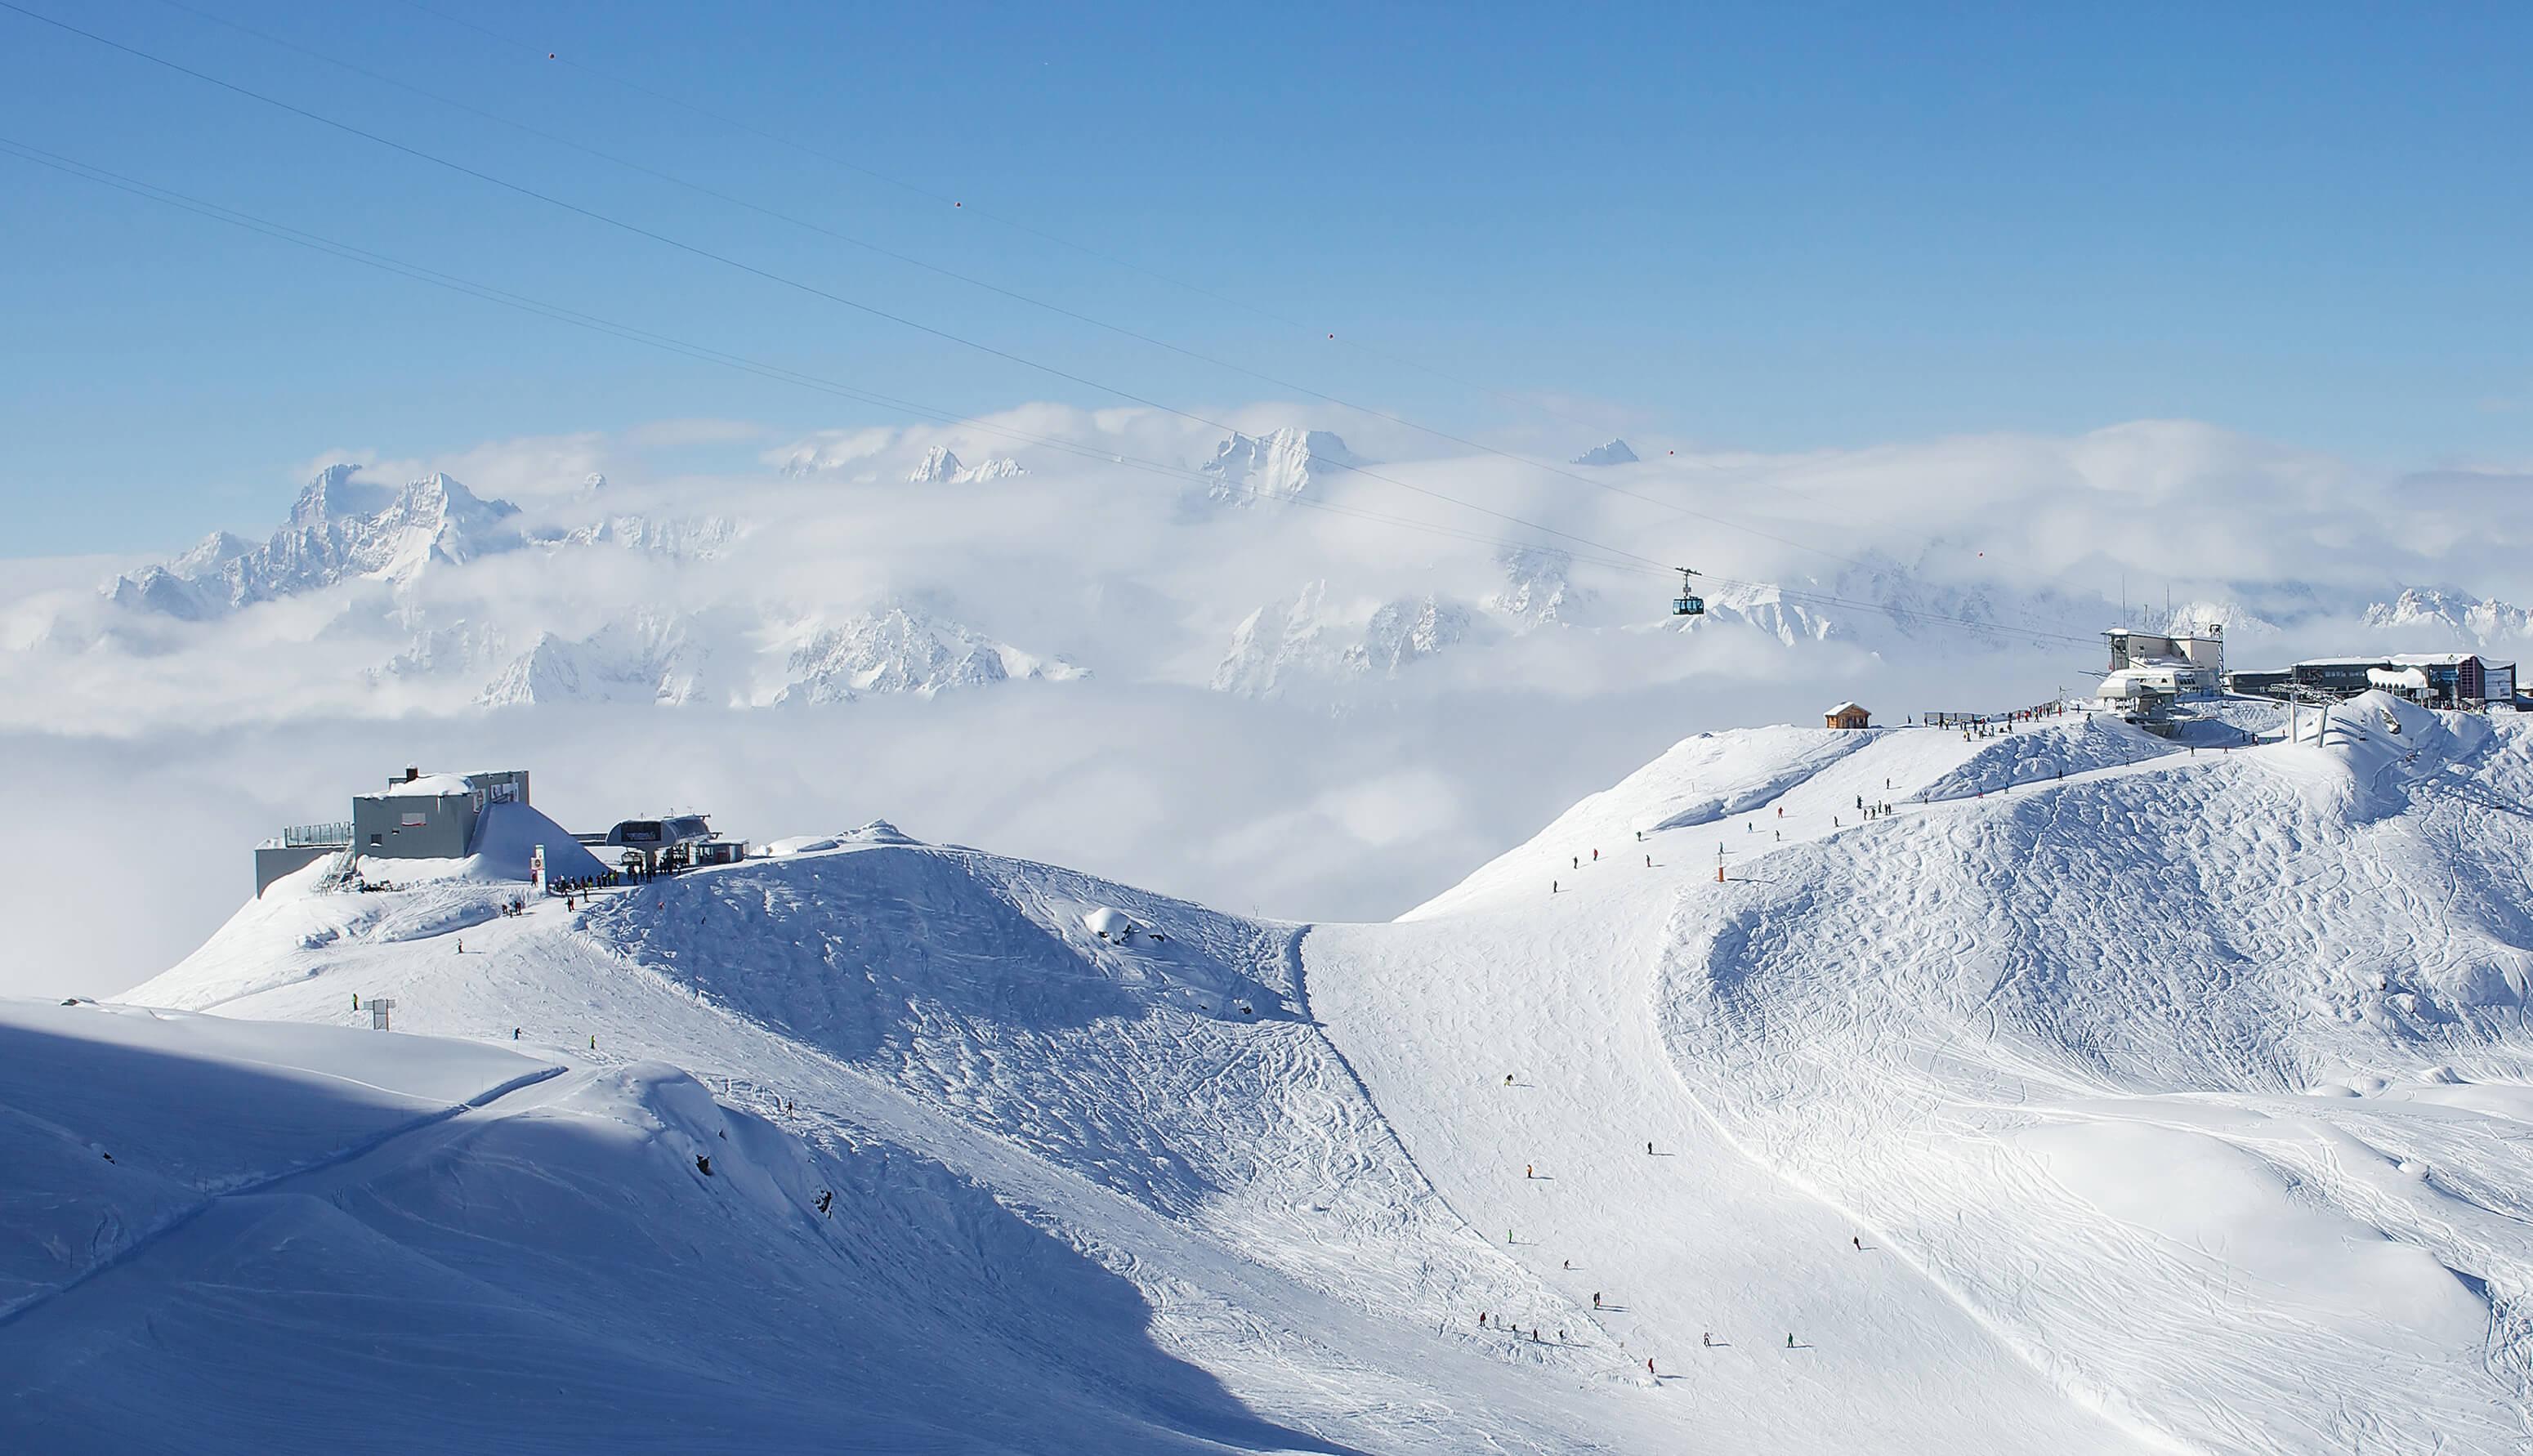 Berg Winter Schnee Seilbahn bewölkt